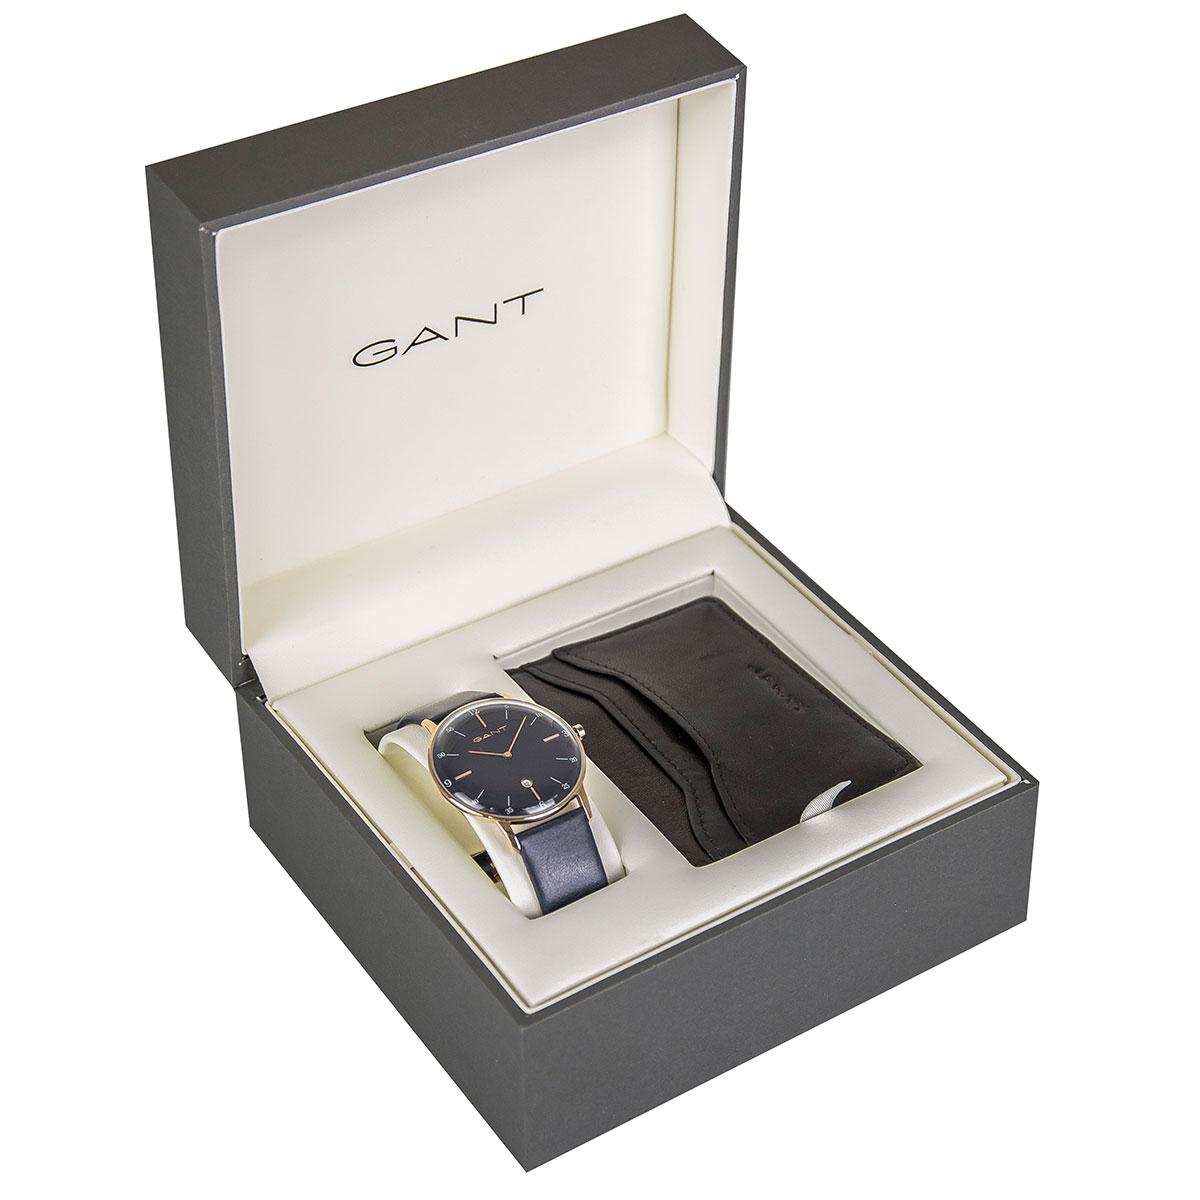 db242e78477d Προσφορά Ρολόι Gant PHOENIX GT046005